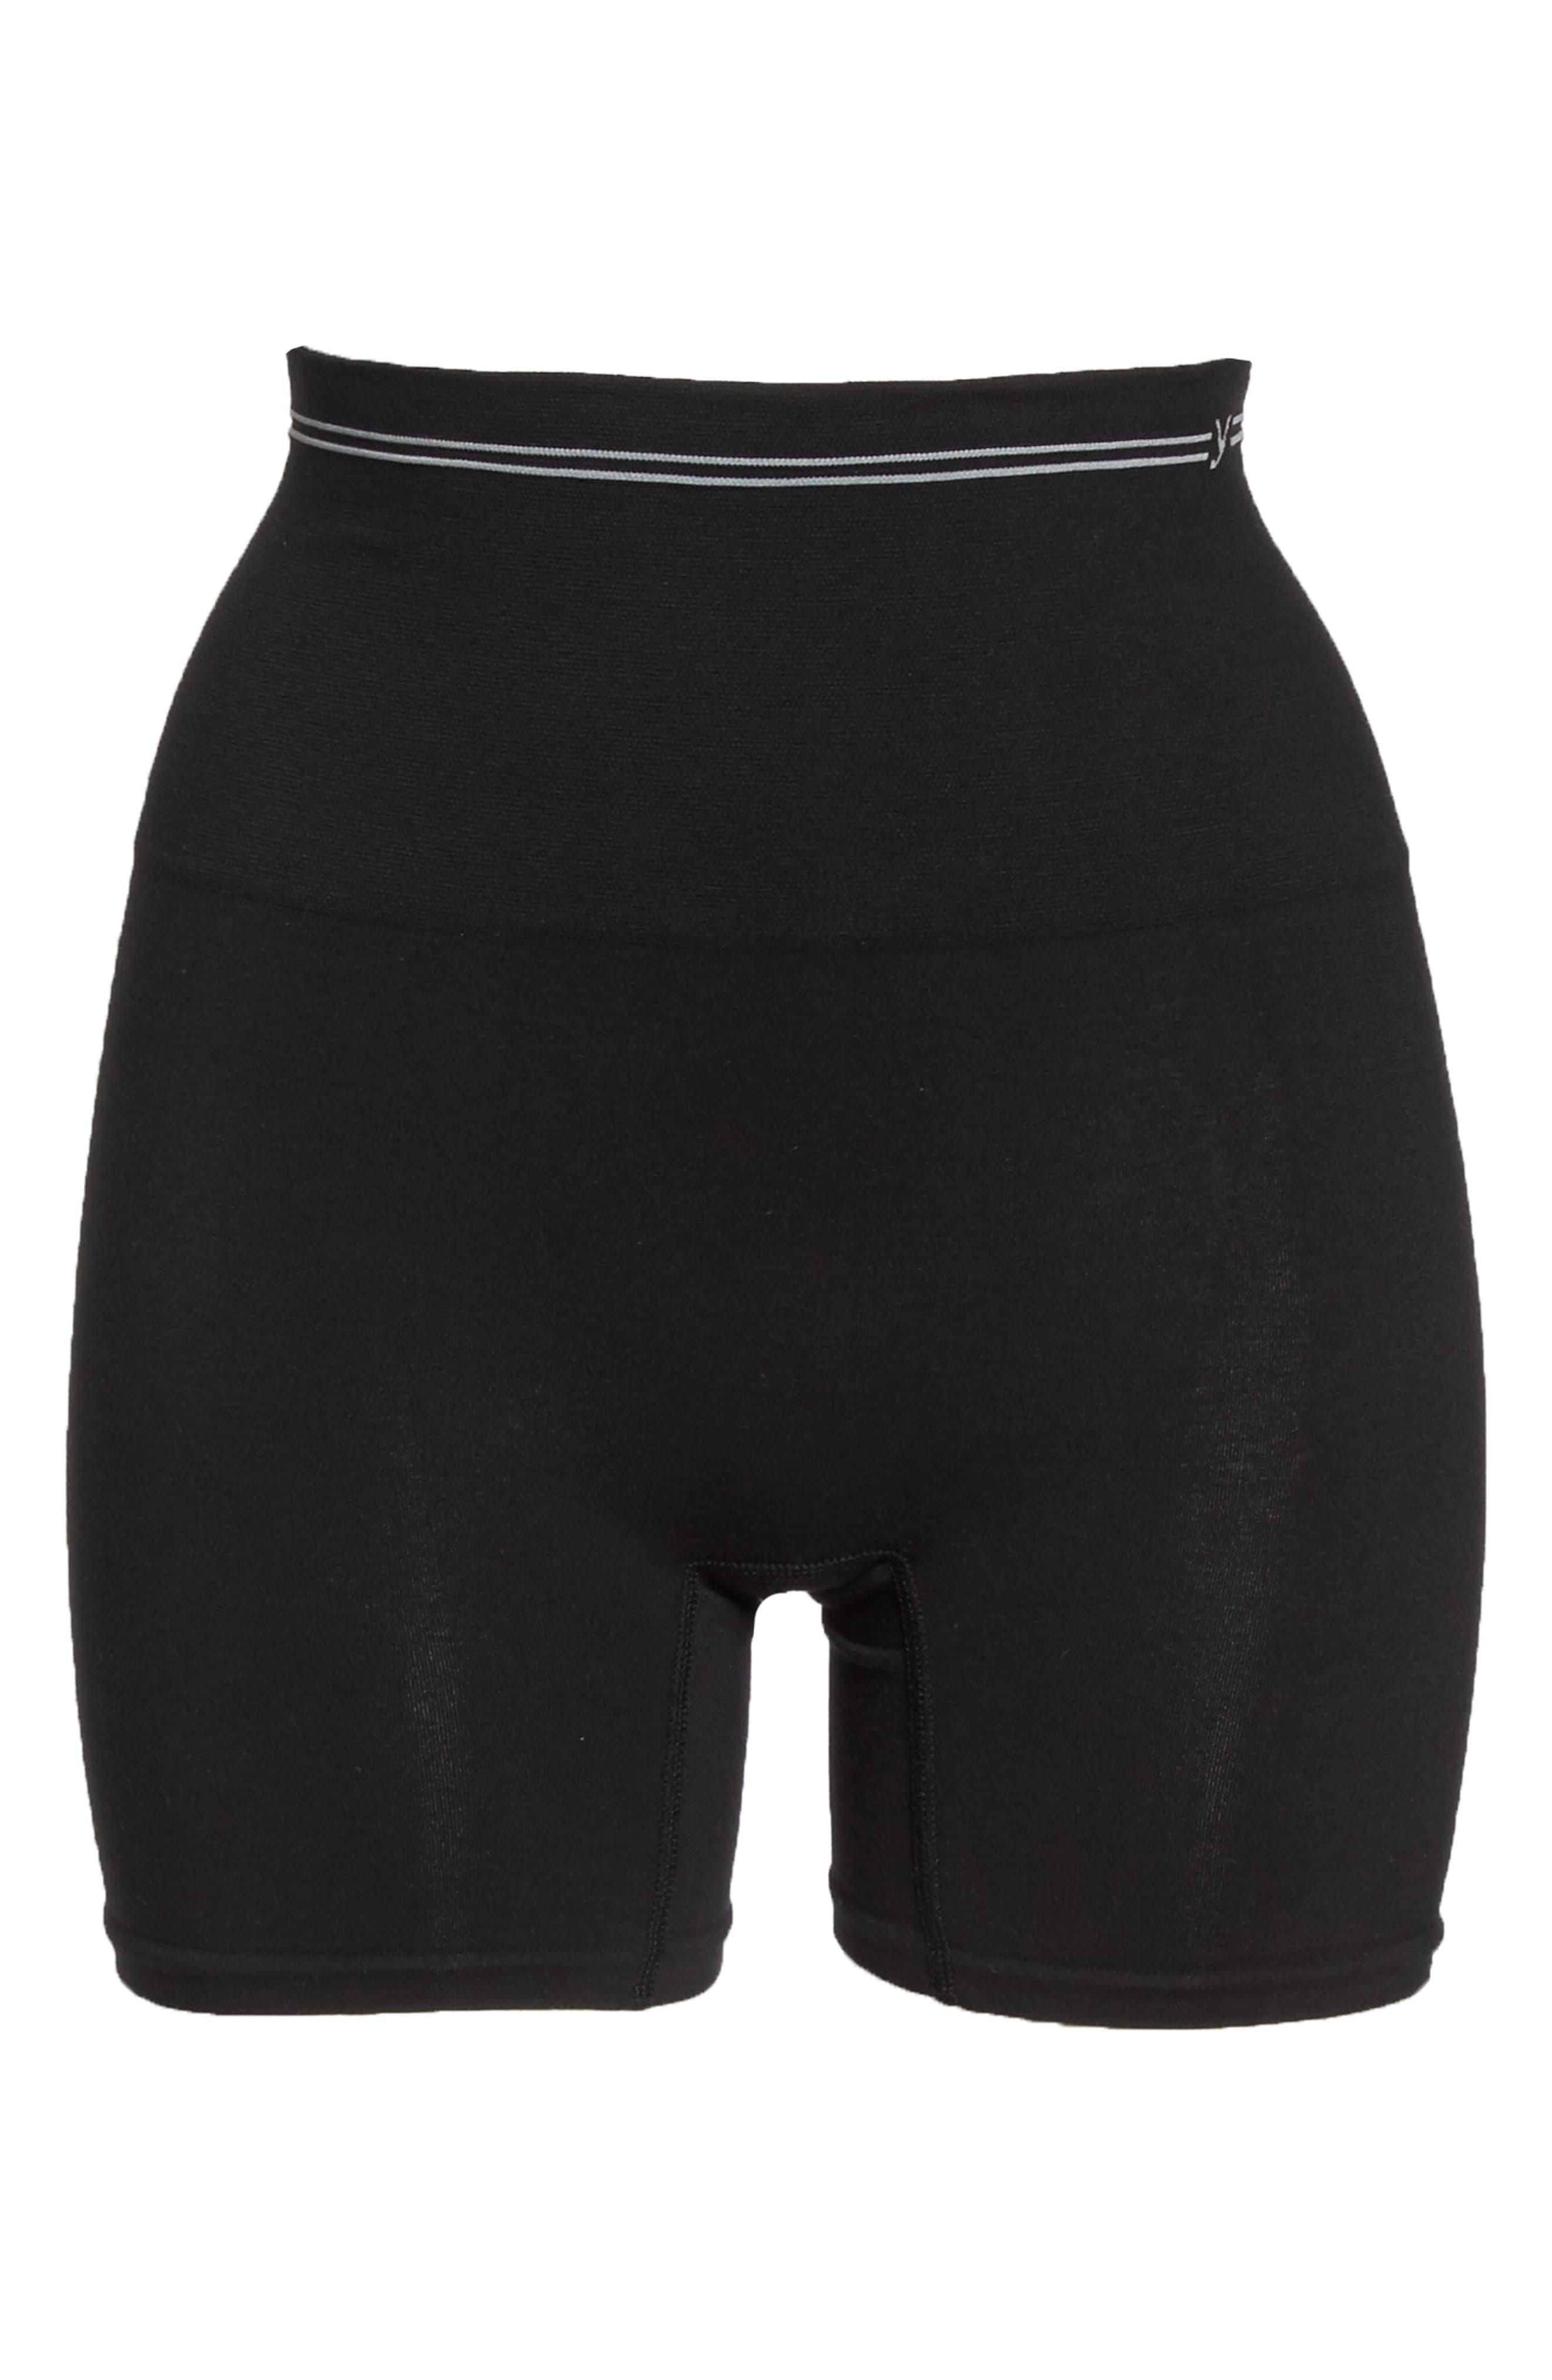 YUMMIE,                             Seamless Shaping Shorts,                             Alternate thumbnail 6, color,                             001